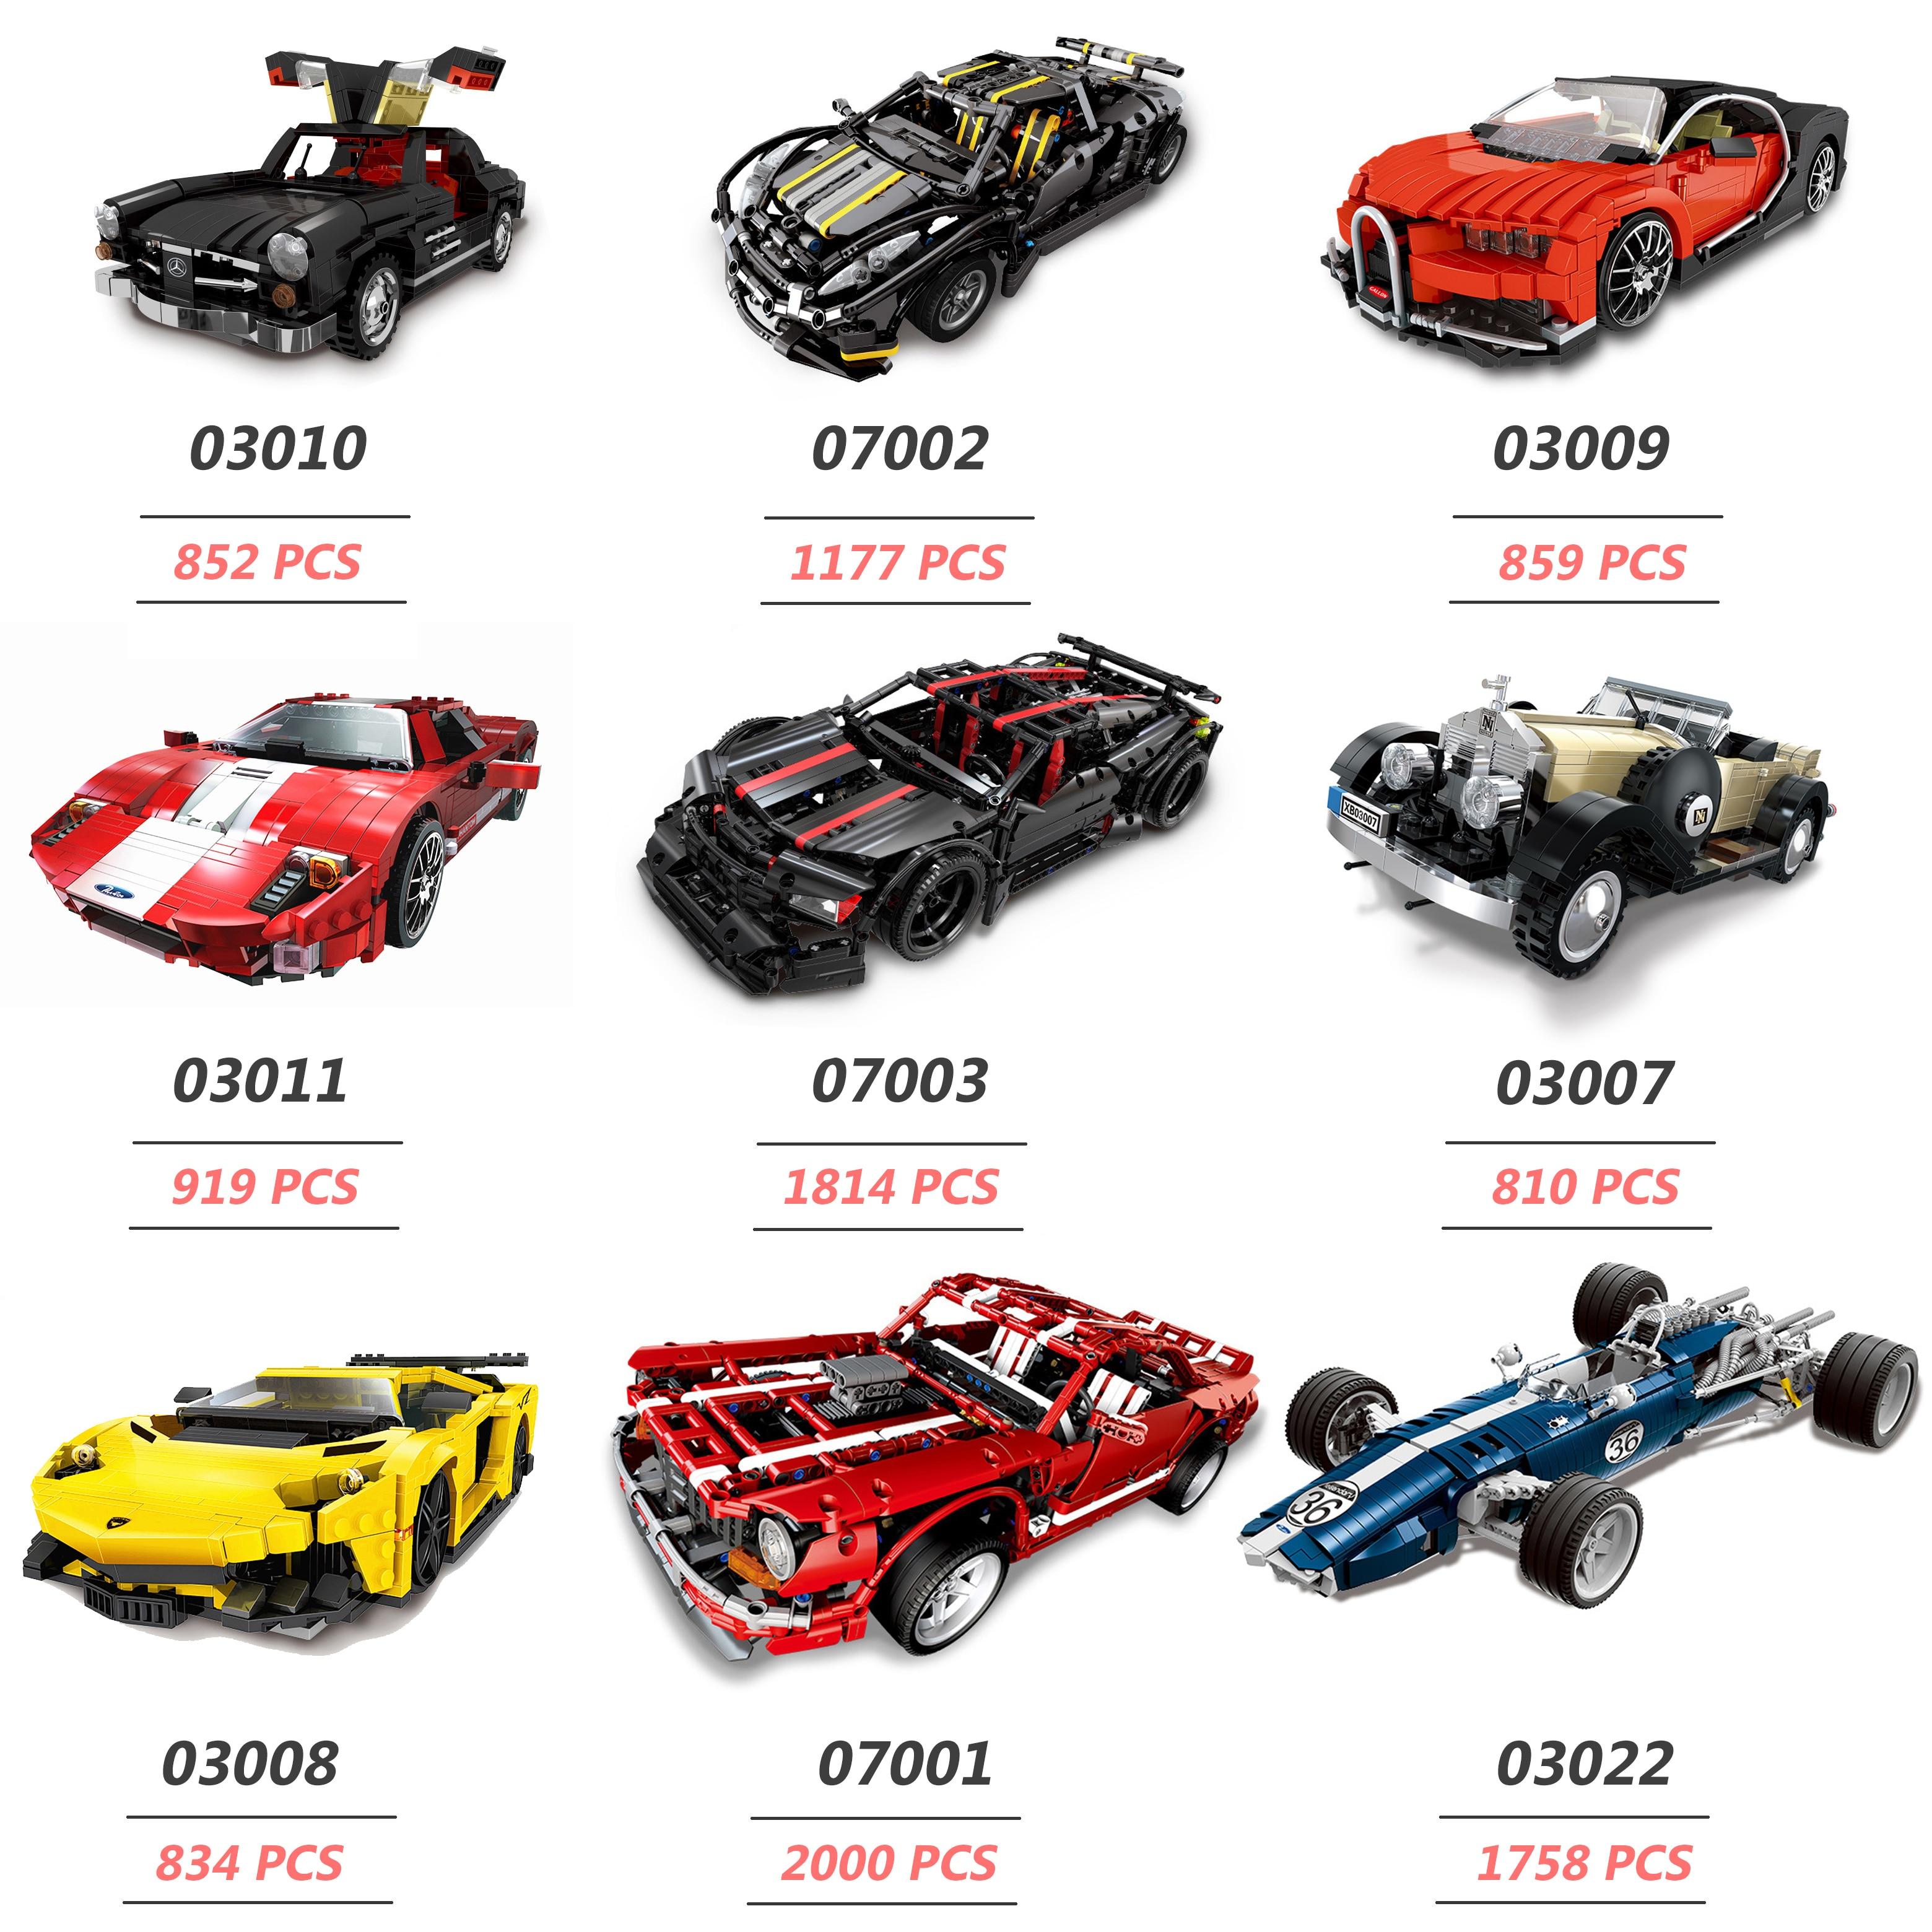 xingbao nova tecnica carro serie 03022 03008 07003 o nobre corrida futuro conjuntos de blocos de